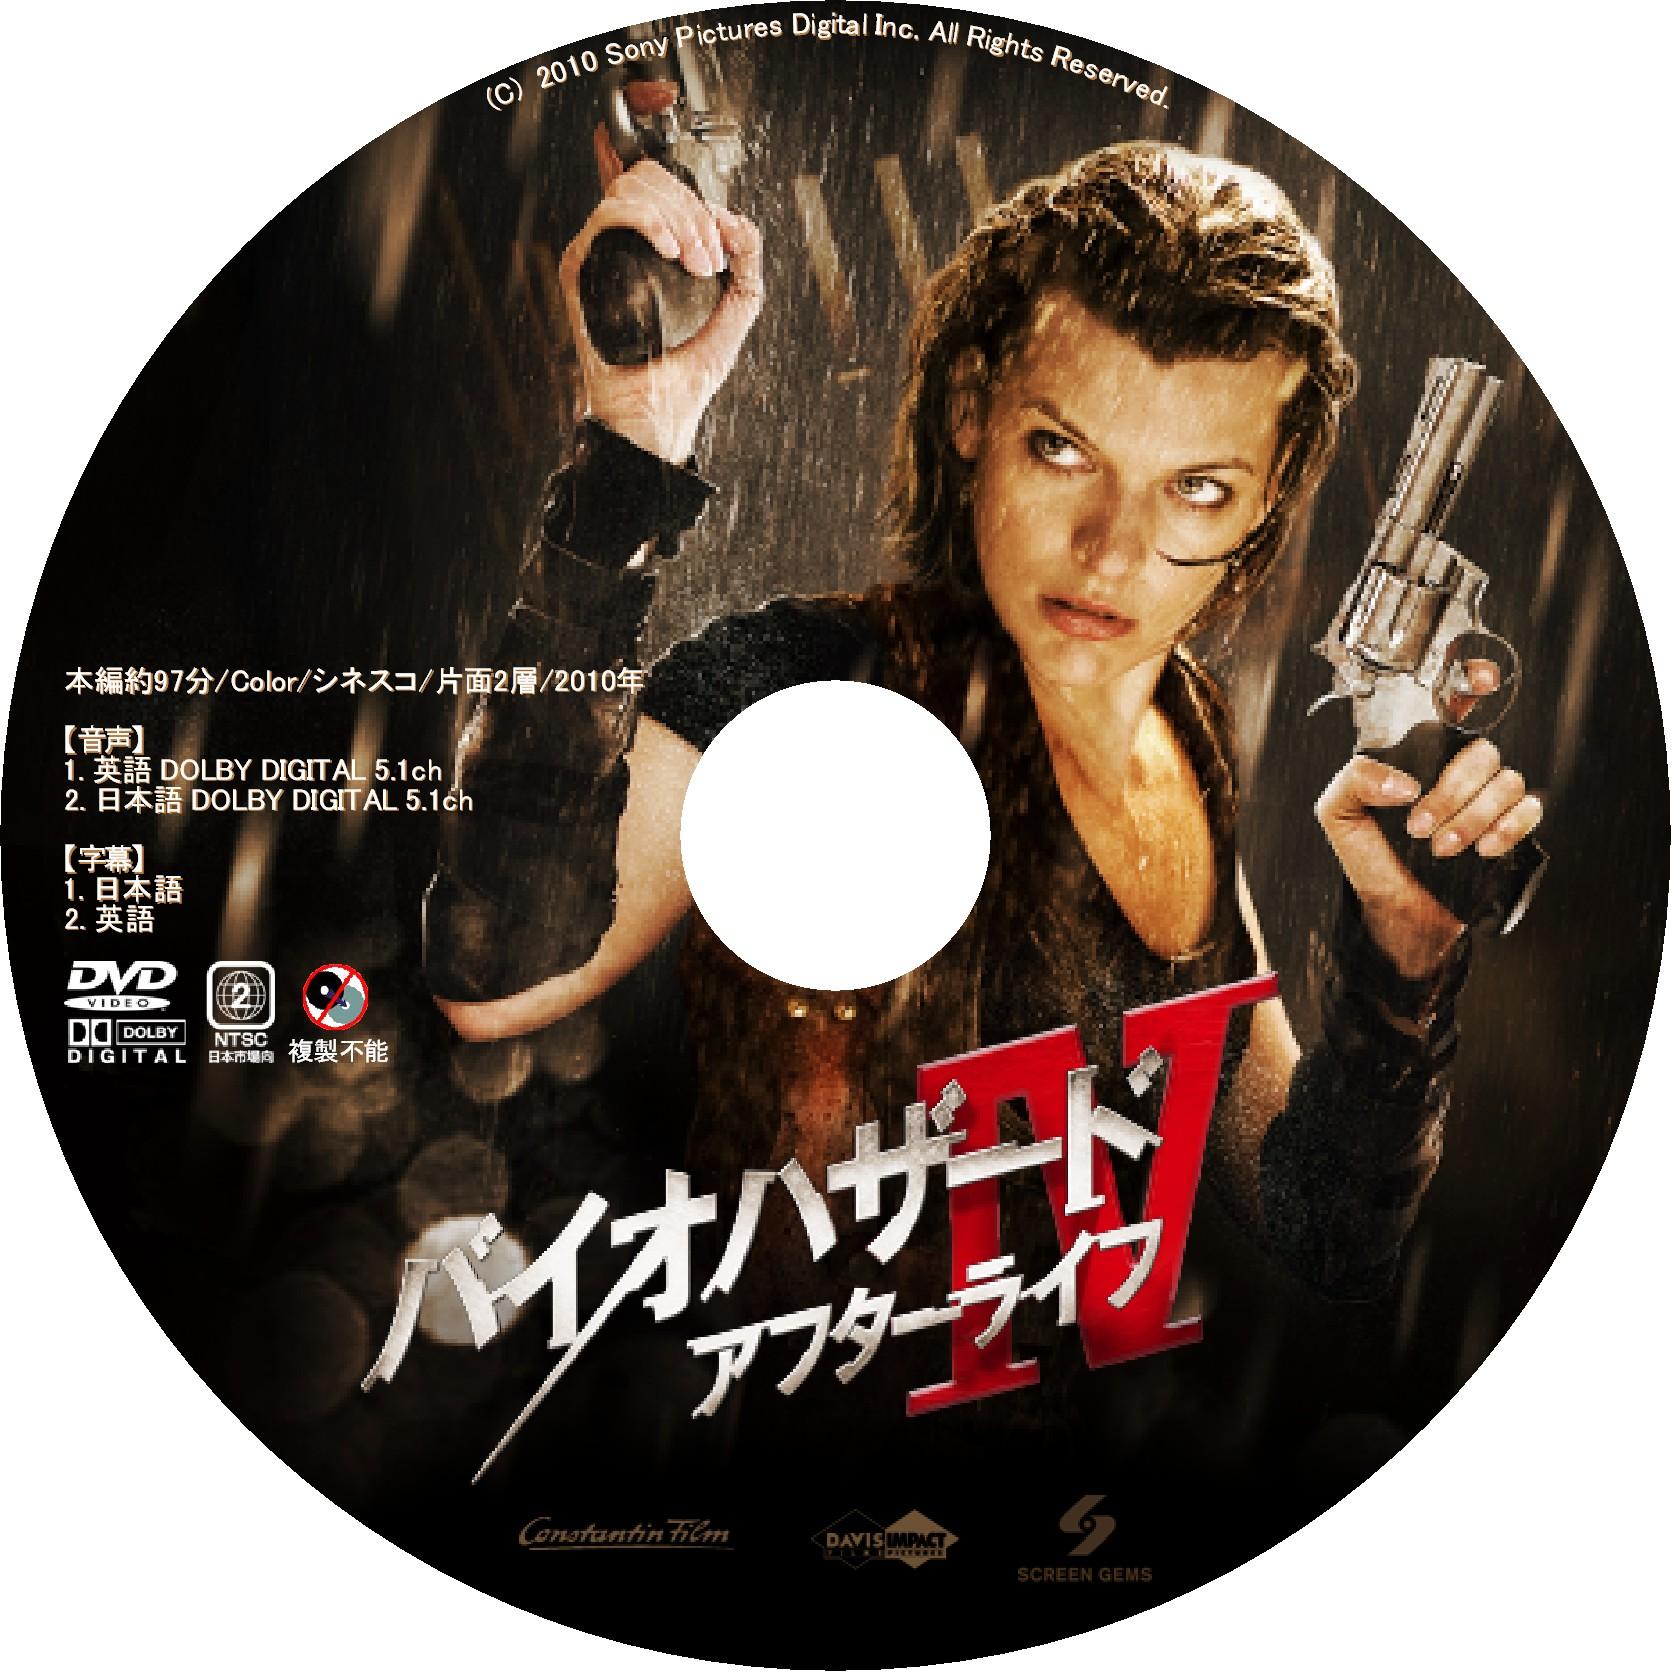 <b>バイオハザード4</b> アフターライフ DVDラベル - Superstition:DVD/Blu <b>...</b>